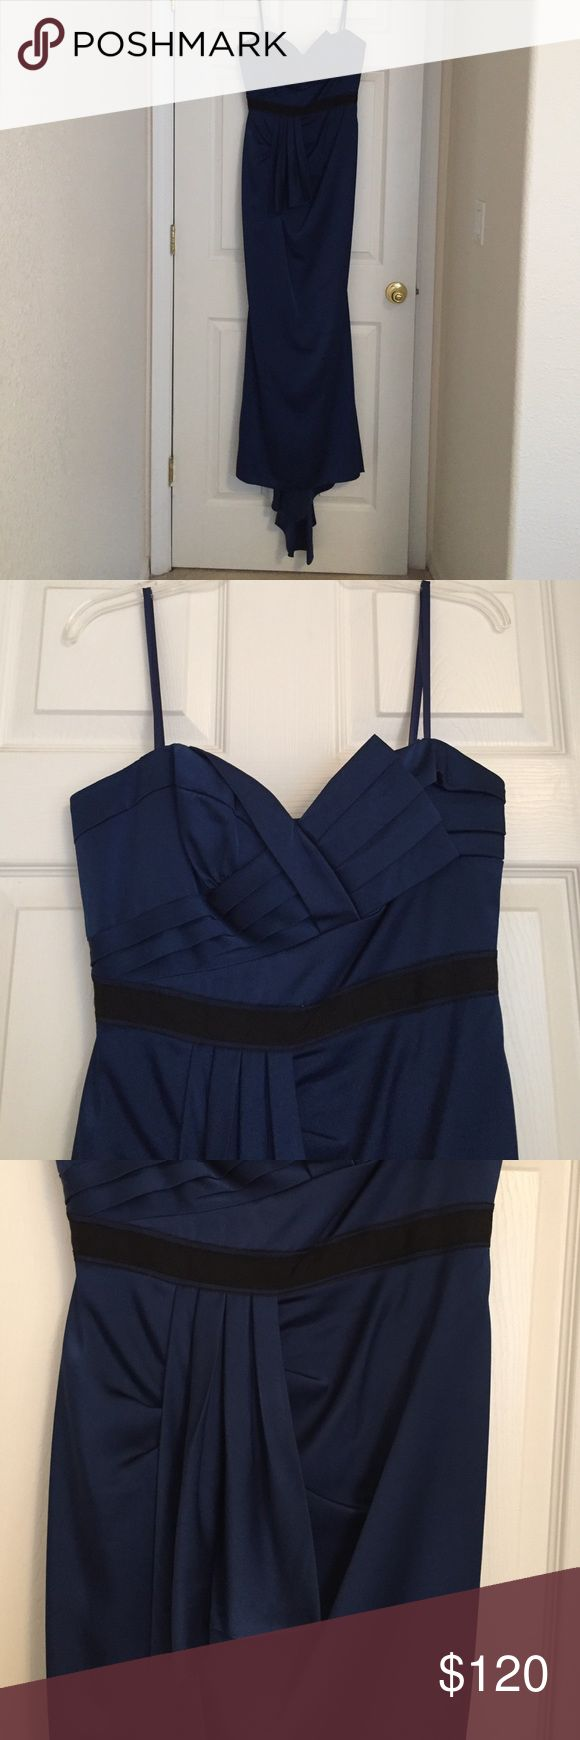 Duchess Satin Dress Brand New! Never been worn! Blue satin long BCBG Maxazria dress. Has a beautiful tail in the back when you walk. BCBGMaxAzria Dresses